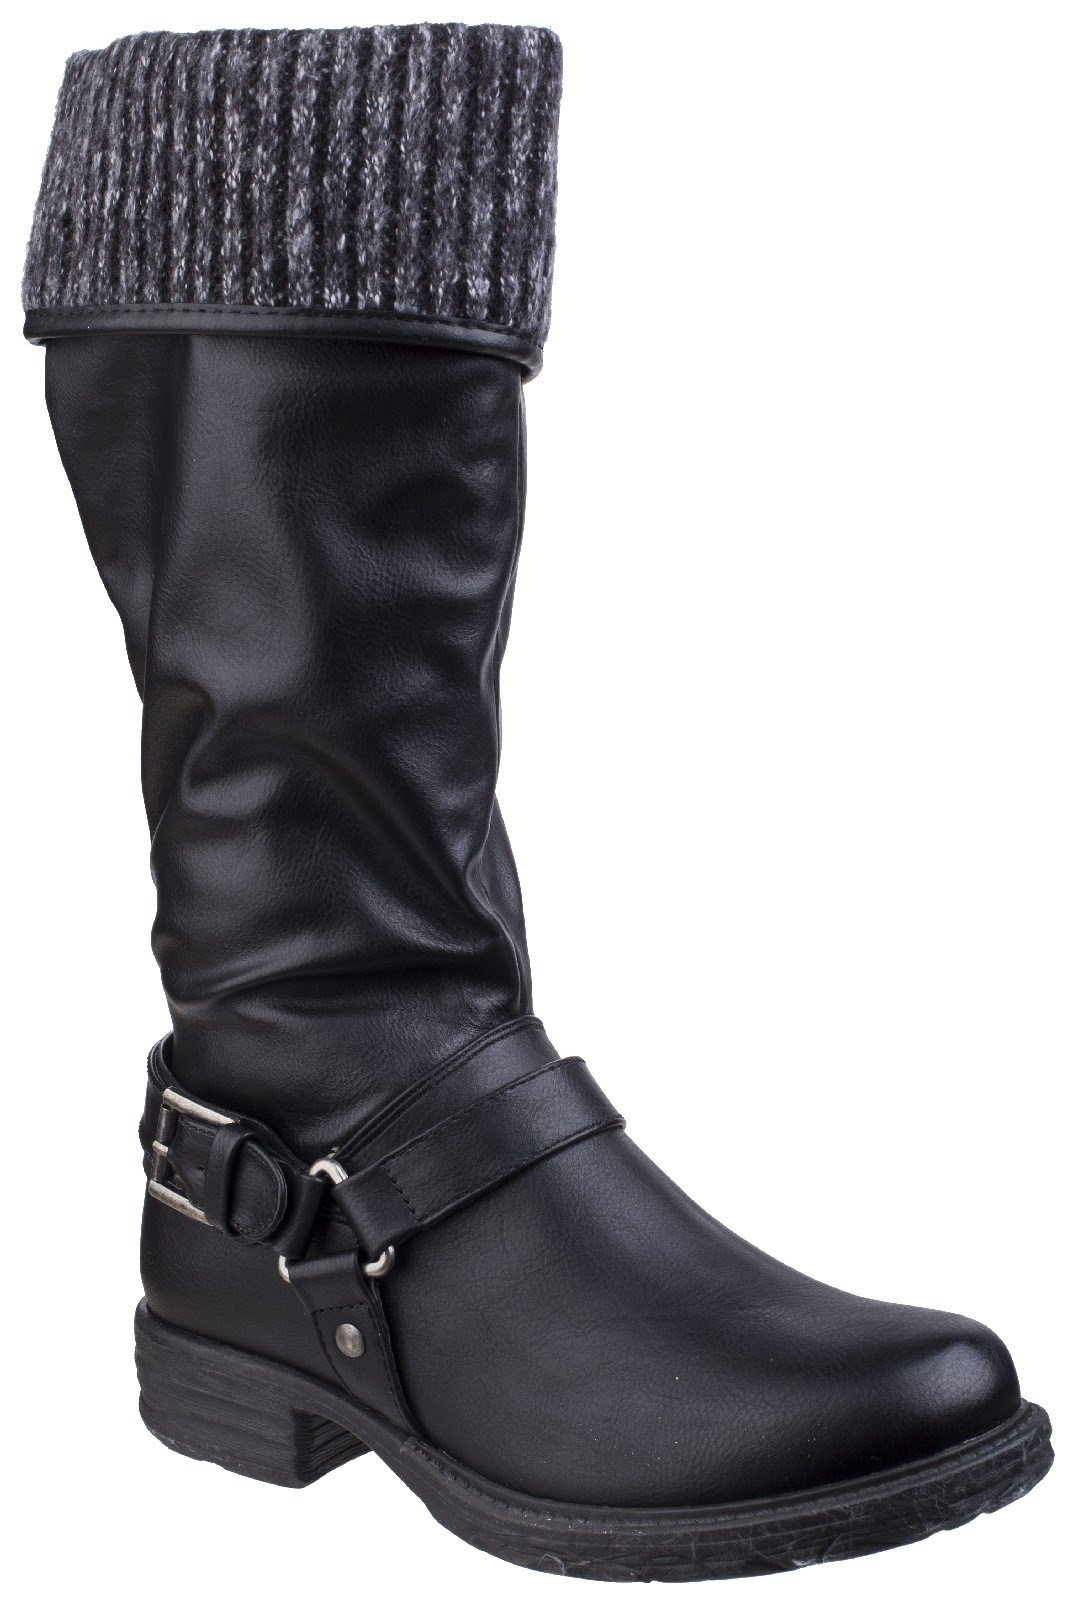 Divaz Women's Monroe Tall Boot Black 25568-42556 - Black 3